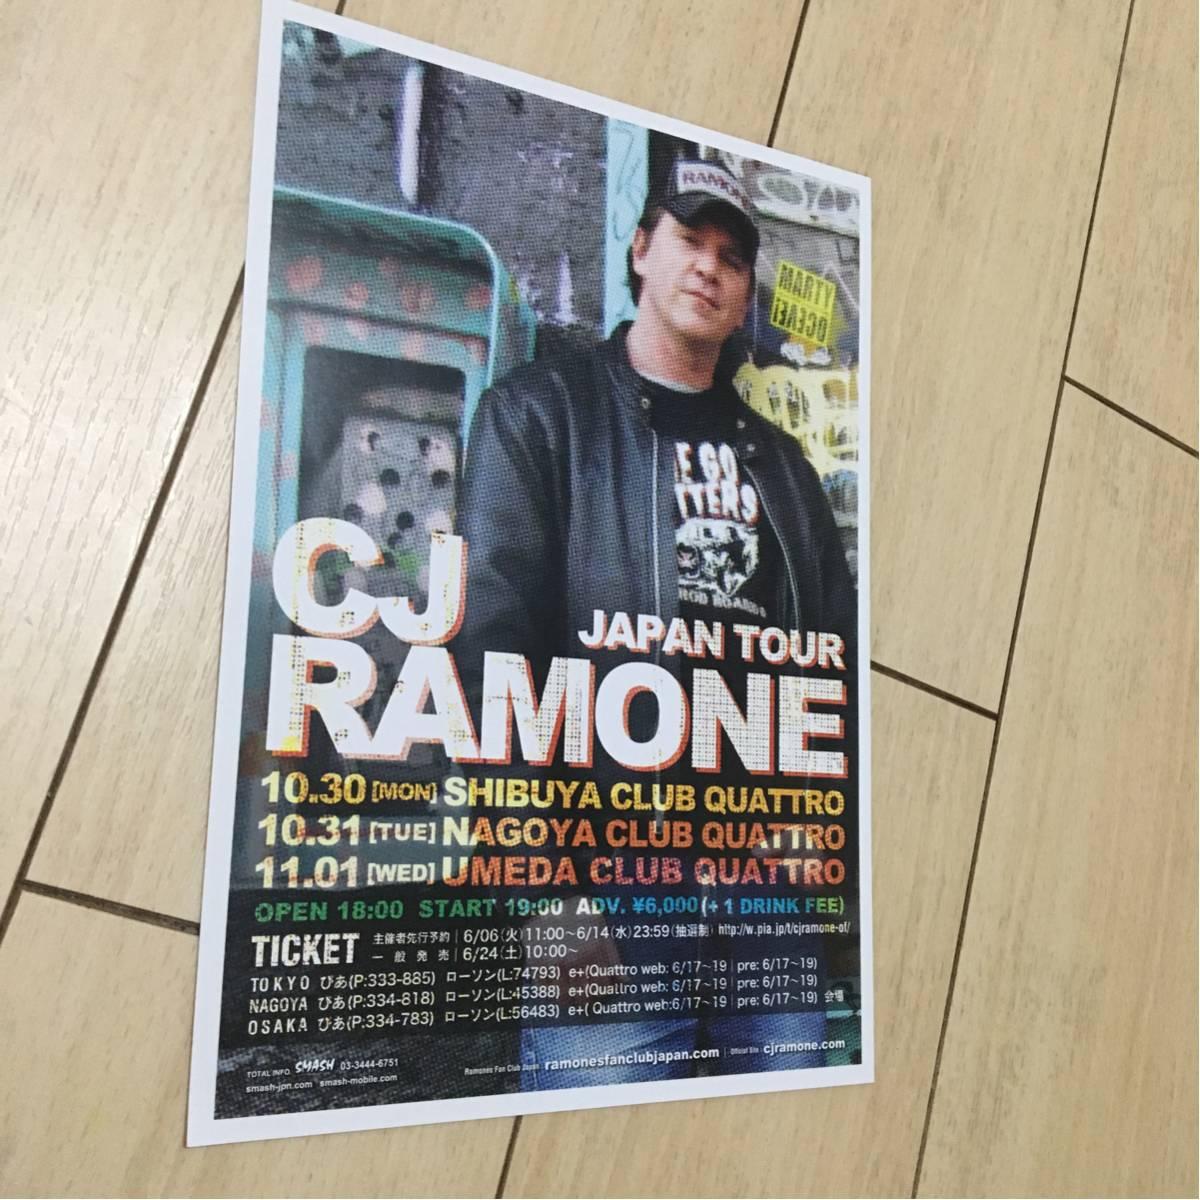 cj ramone ラモーンズ ramones 来日 告知 チラシ 2017 japan tour 大阪 名古屋 東京 ソロ ライブ